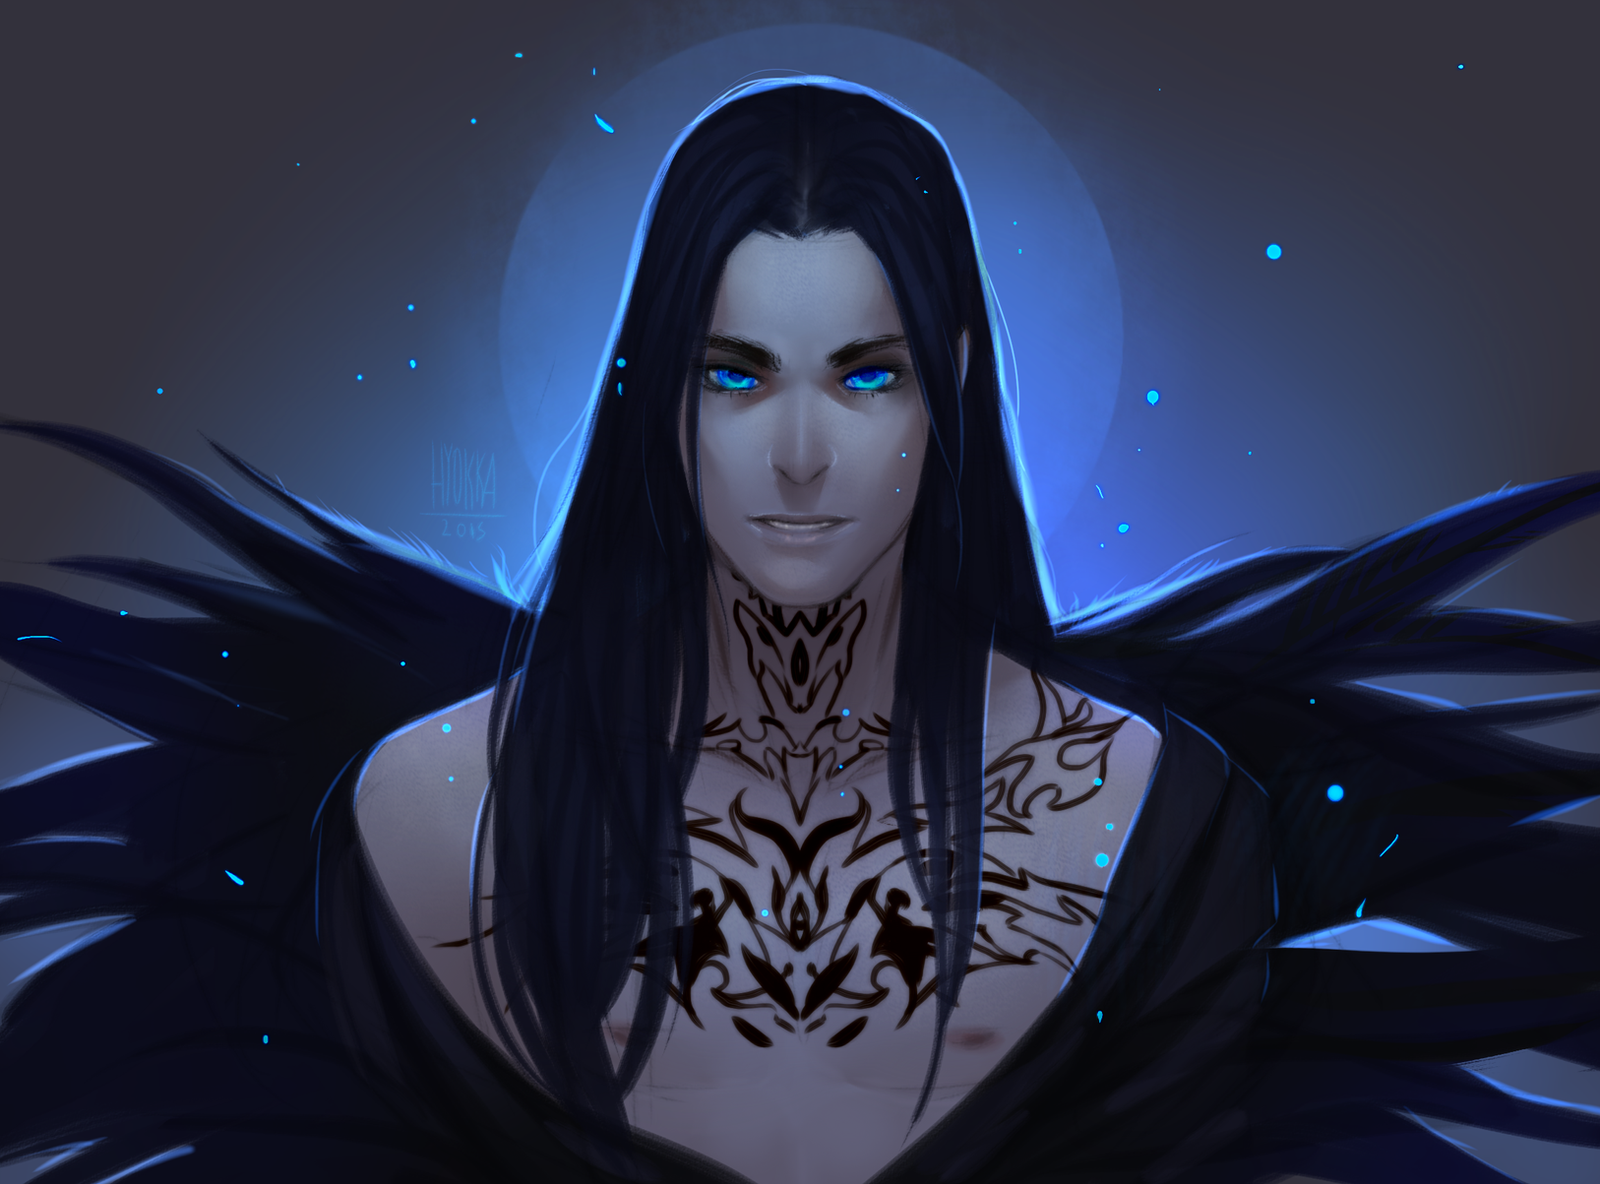 Kanesada Izuminokami - Hell's king [ID] Bjd_lucifer_by_hyokka-d9ddtth